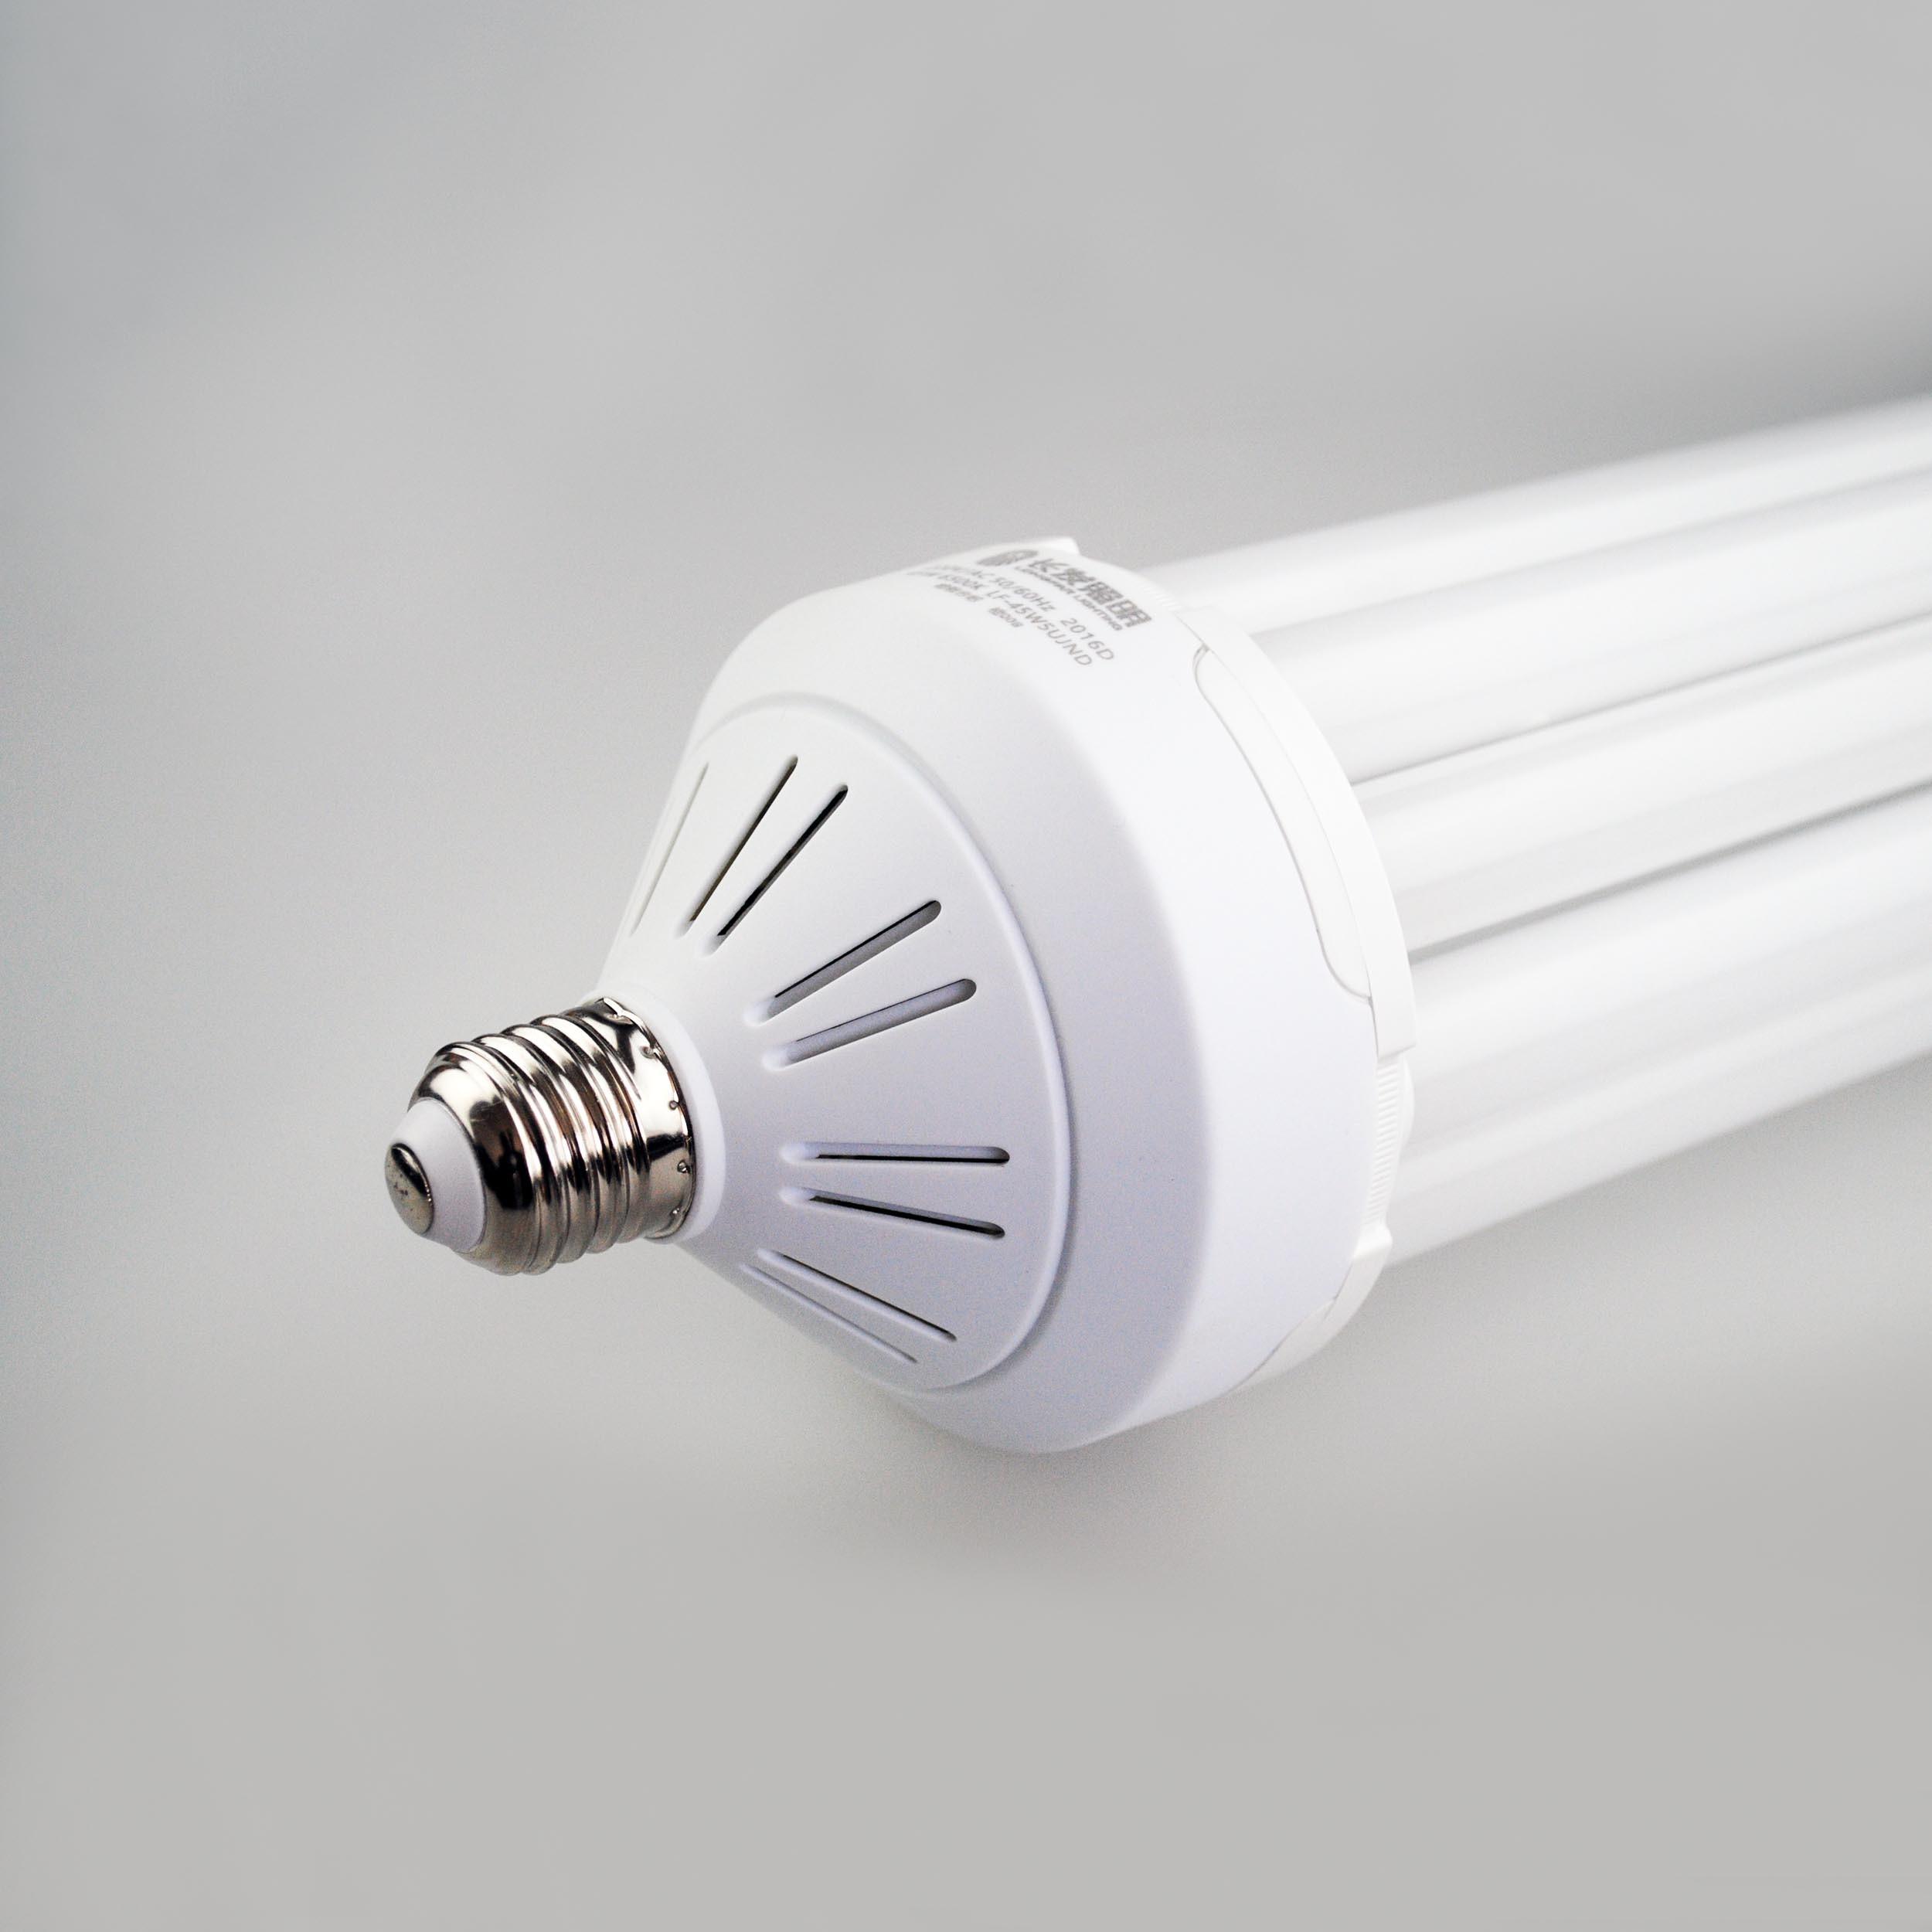 45W SMD2835 International LED Corn Lights